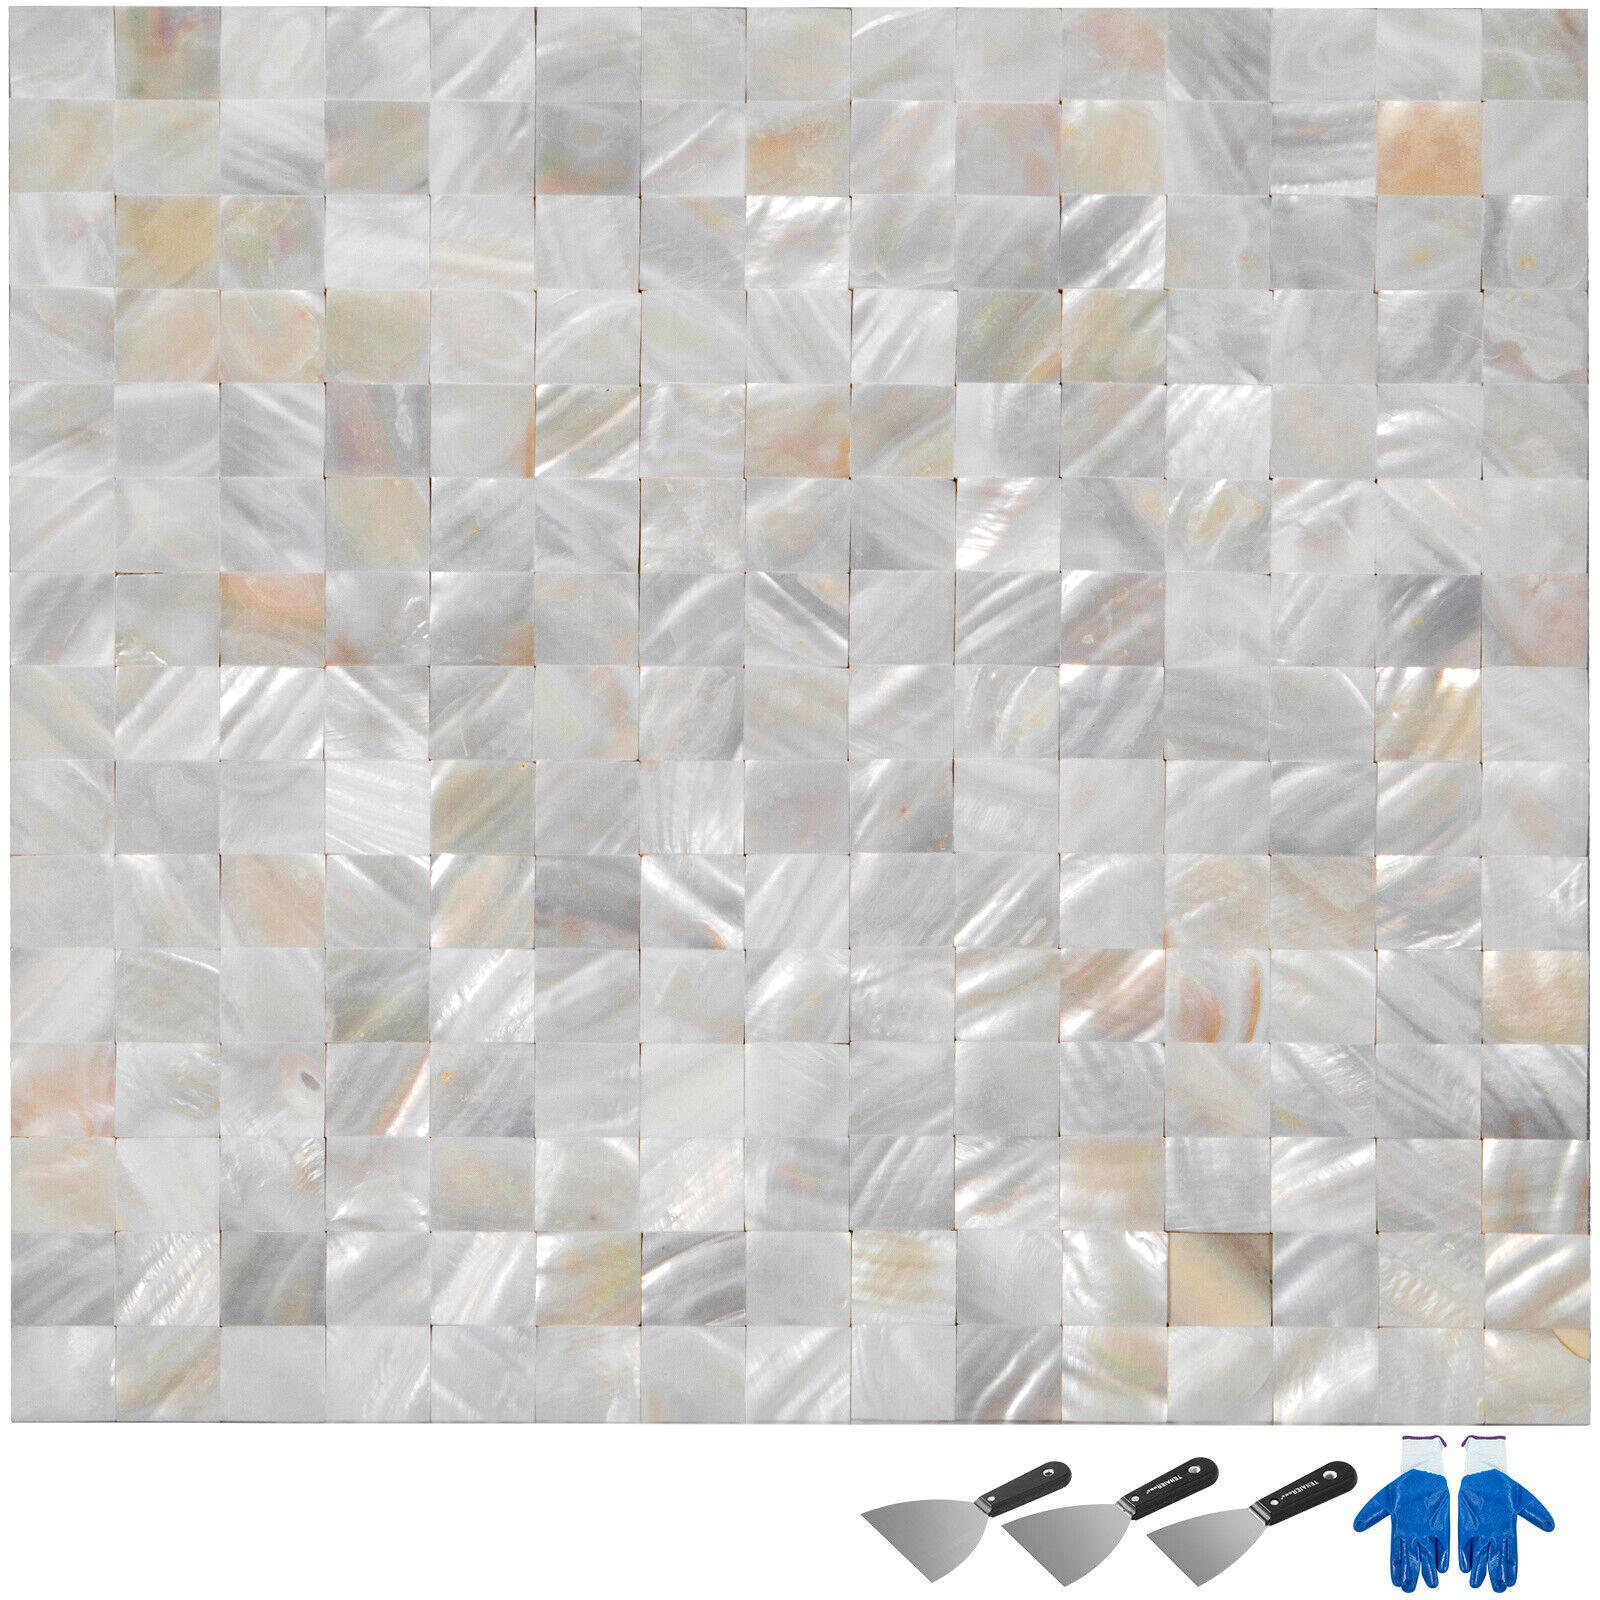 Shell Mosaic Tile Mother Of Pearl Tile For Bathroom Kitchen Backsplash 11sq Feet For Sale Online